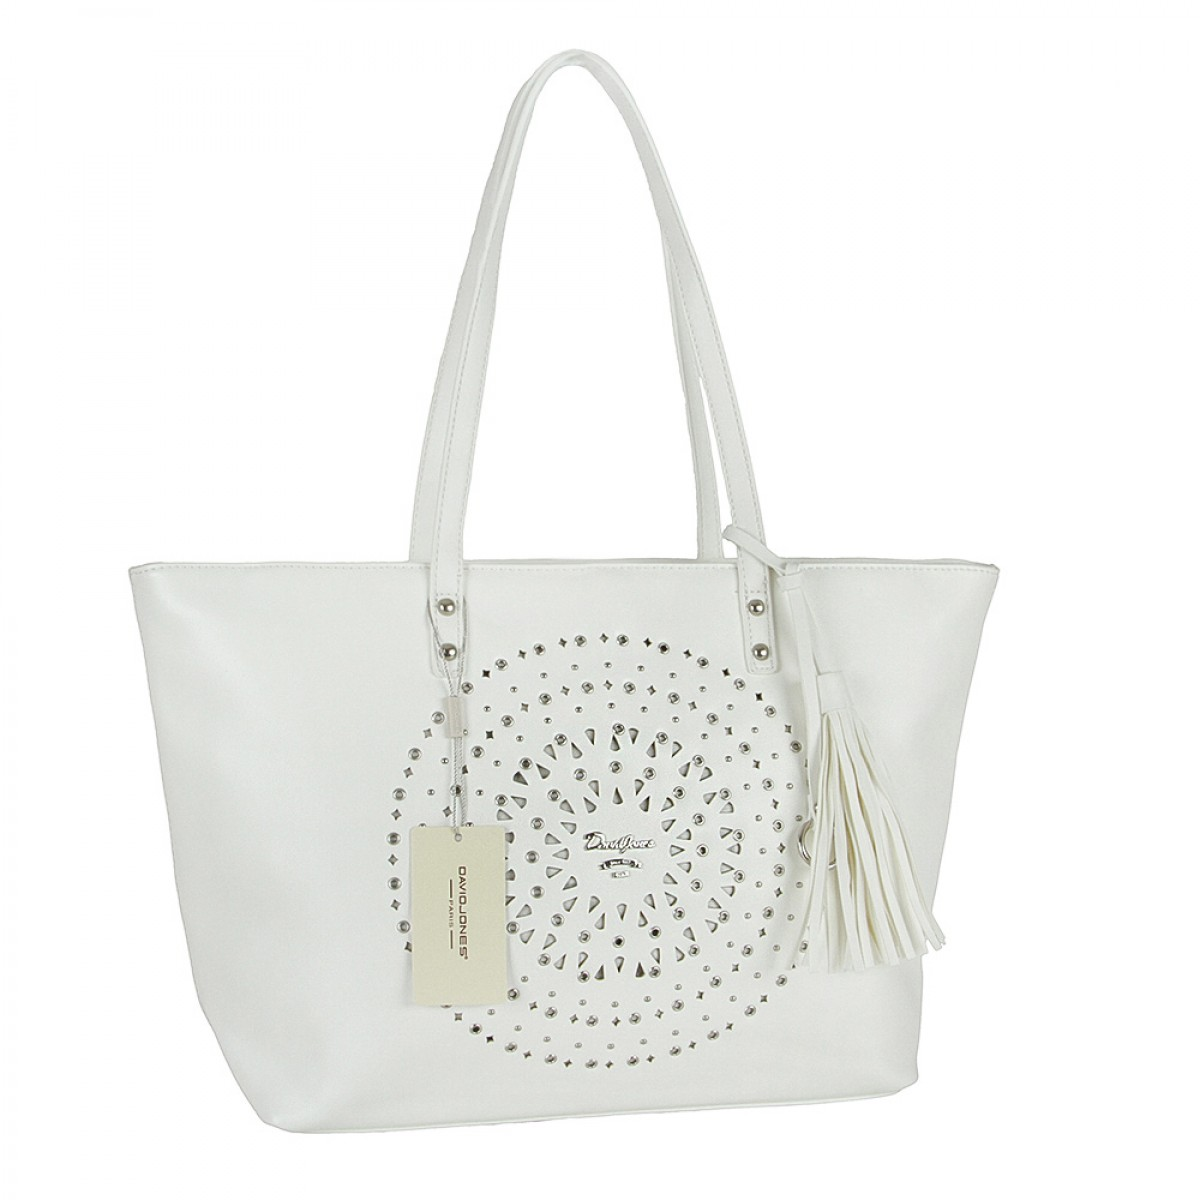 Жіноча сумка David Jones 5942-2 WHITE